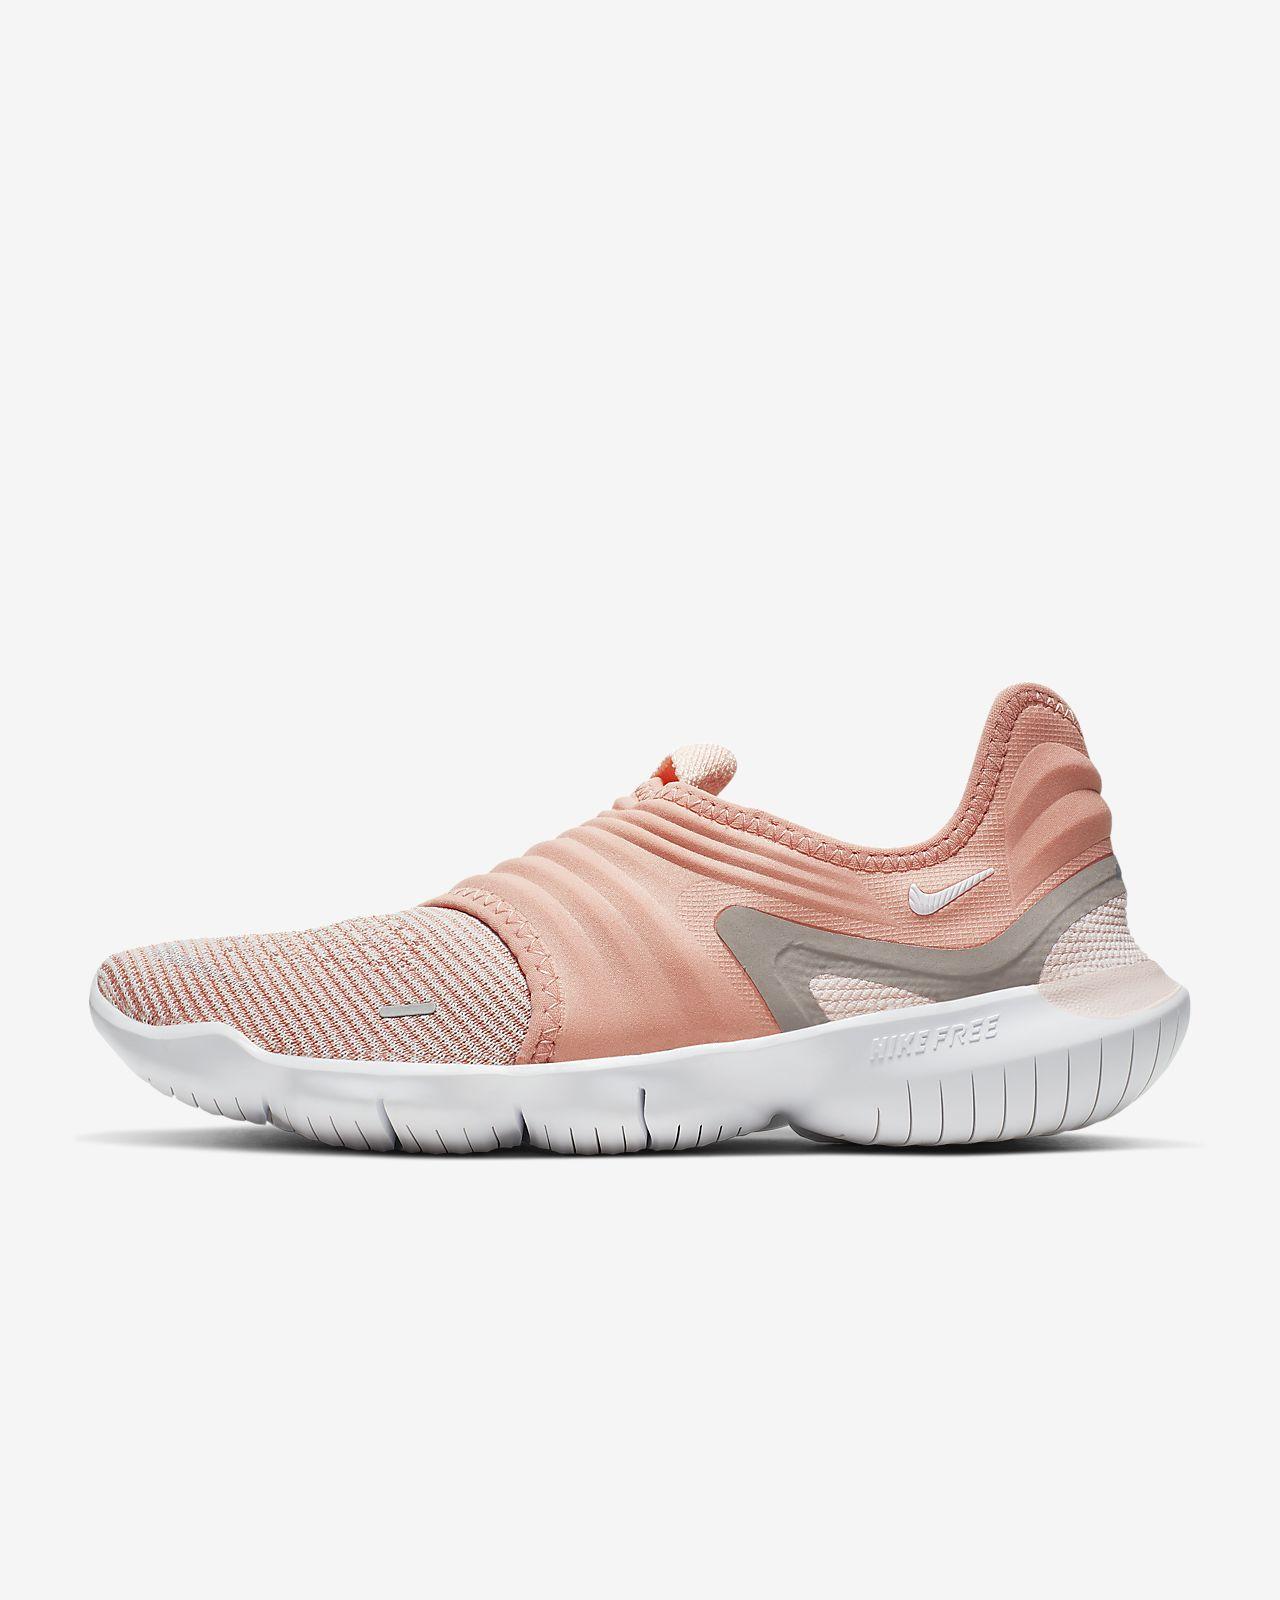 Nike Free RN Flyknit 3.0 Zapatillas de running - Mujer